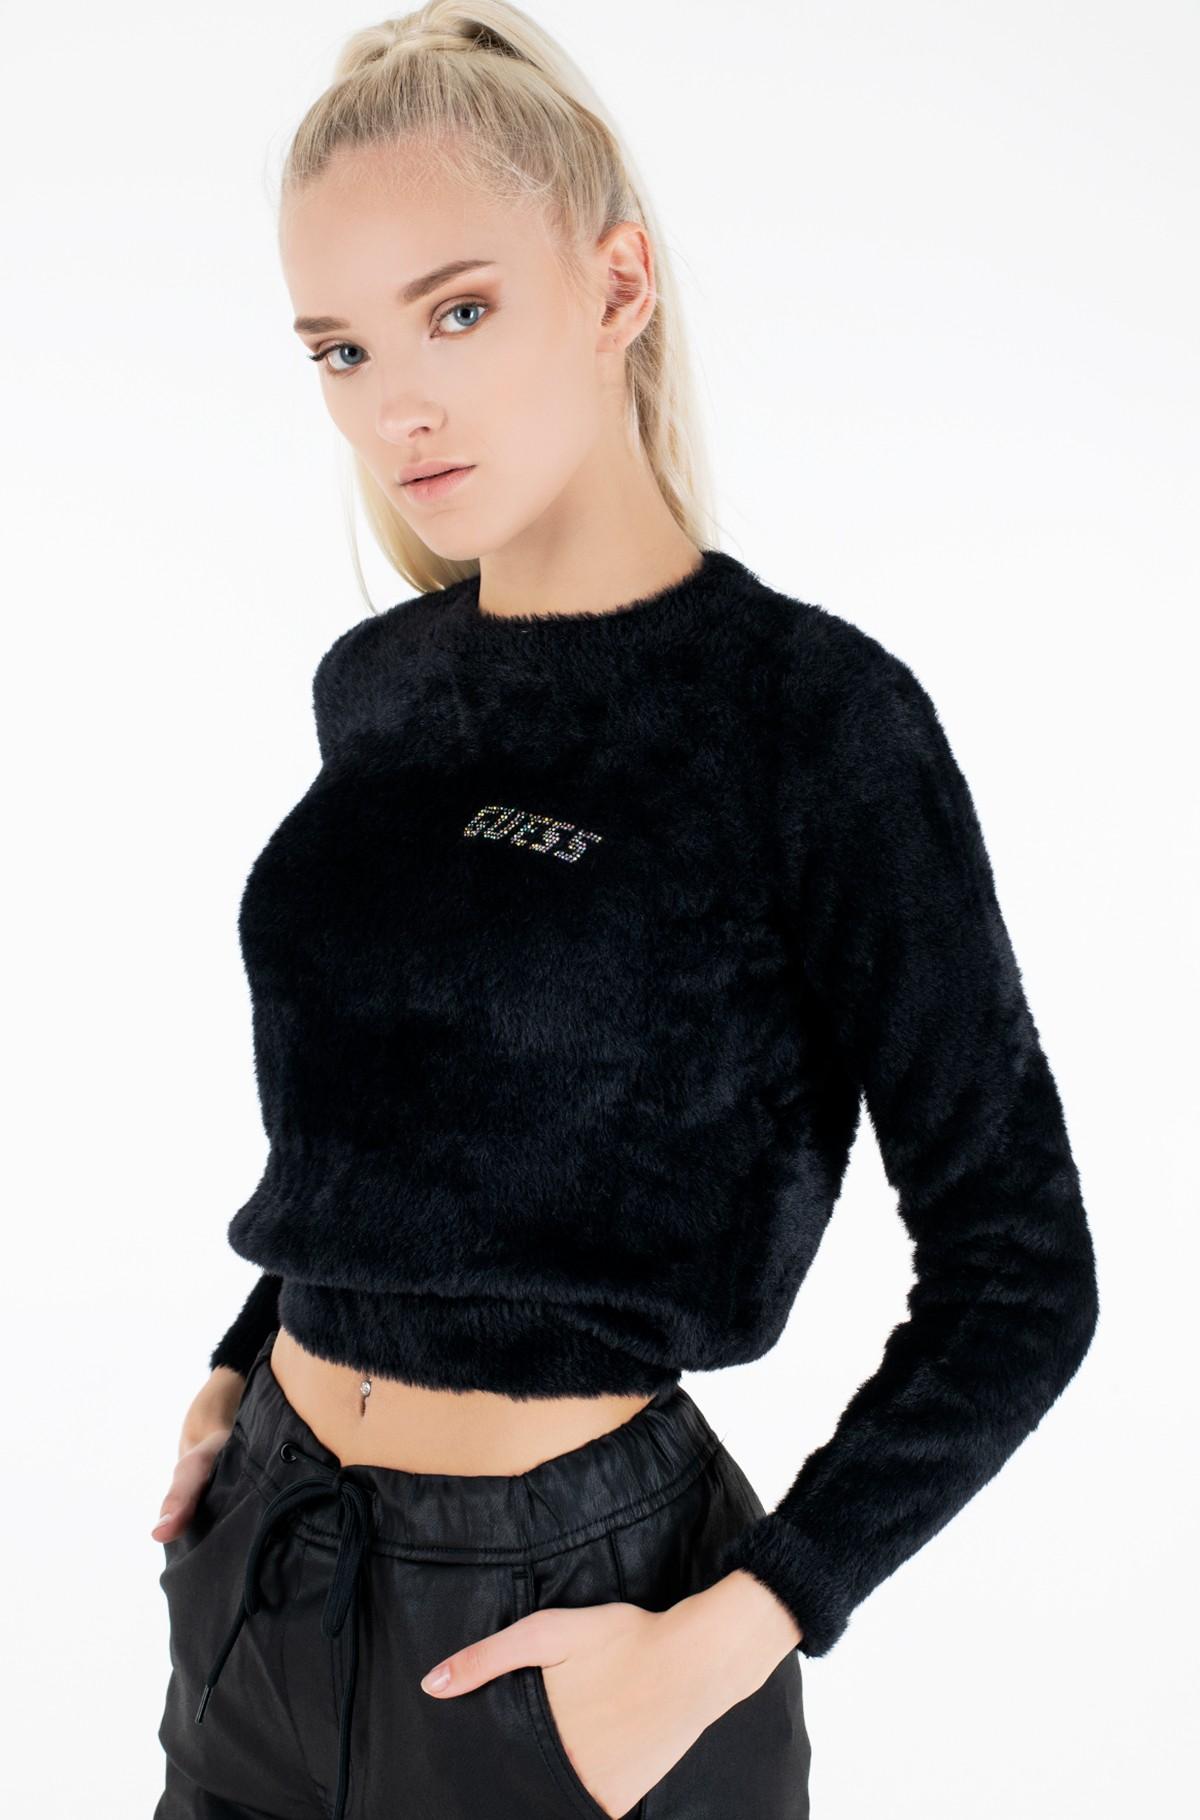 Sweater W0BR0L Z2740-full-1